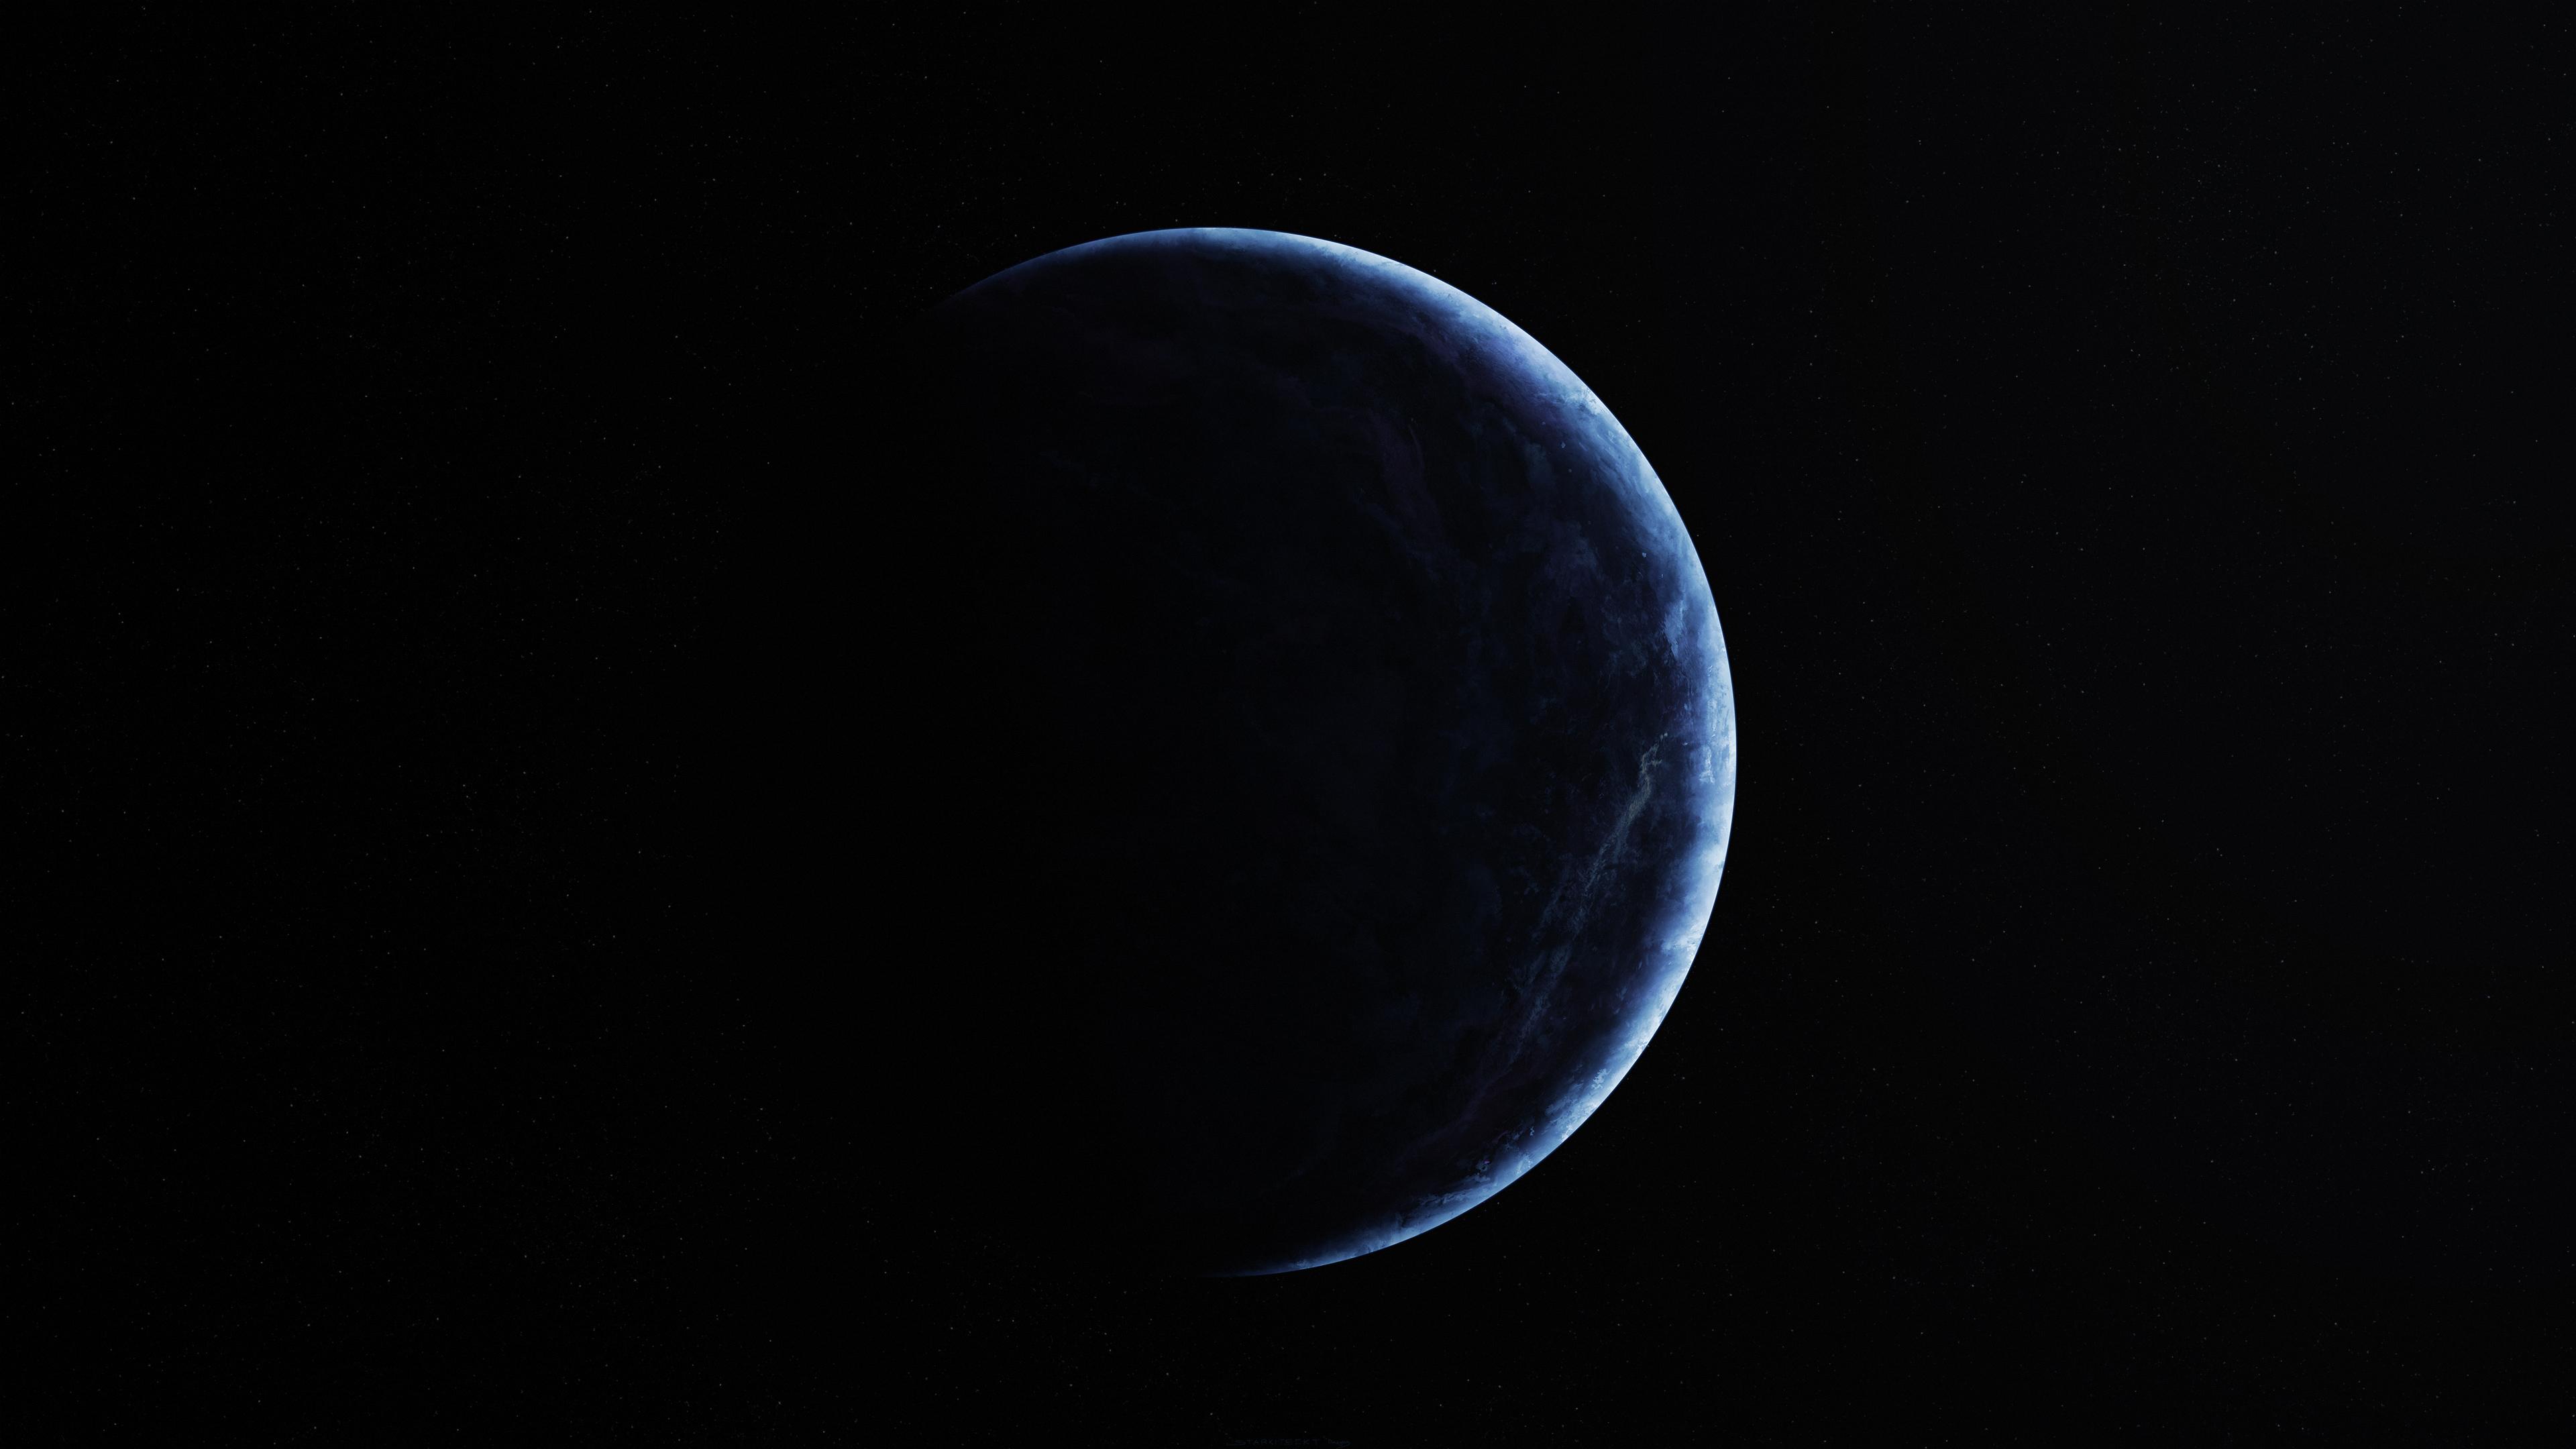 earth a blue dot 4k 1546279341 - Earth A Blue Dot 4k - hd-wallpapers, earth wallpapers, digital universe wallpapers, digital art wallpapers, deviantart wallpapers, artwork wallpapers, artist wallpapers, 4k-wallpapers